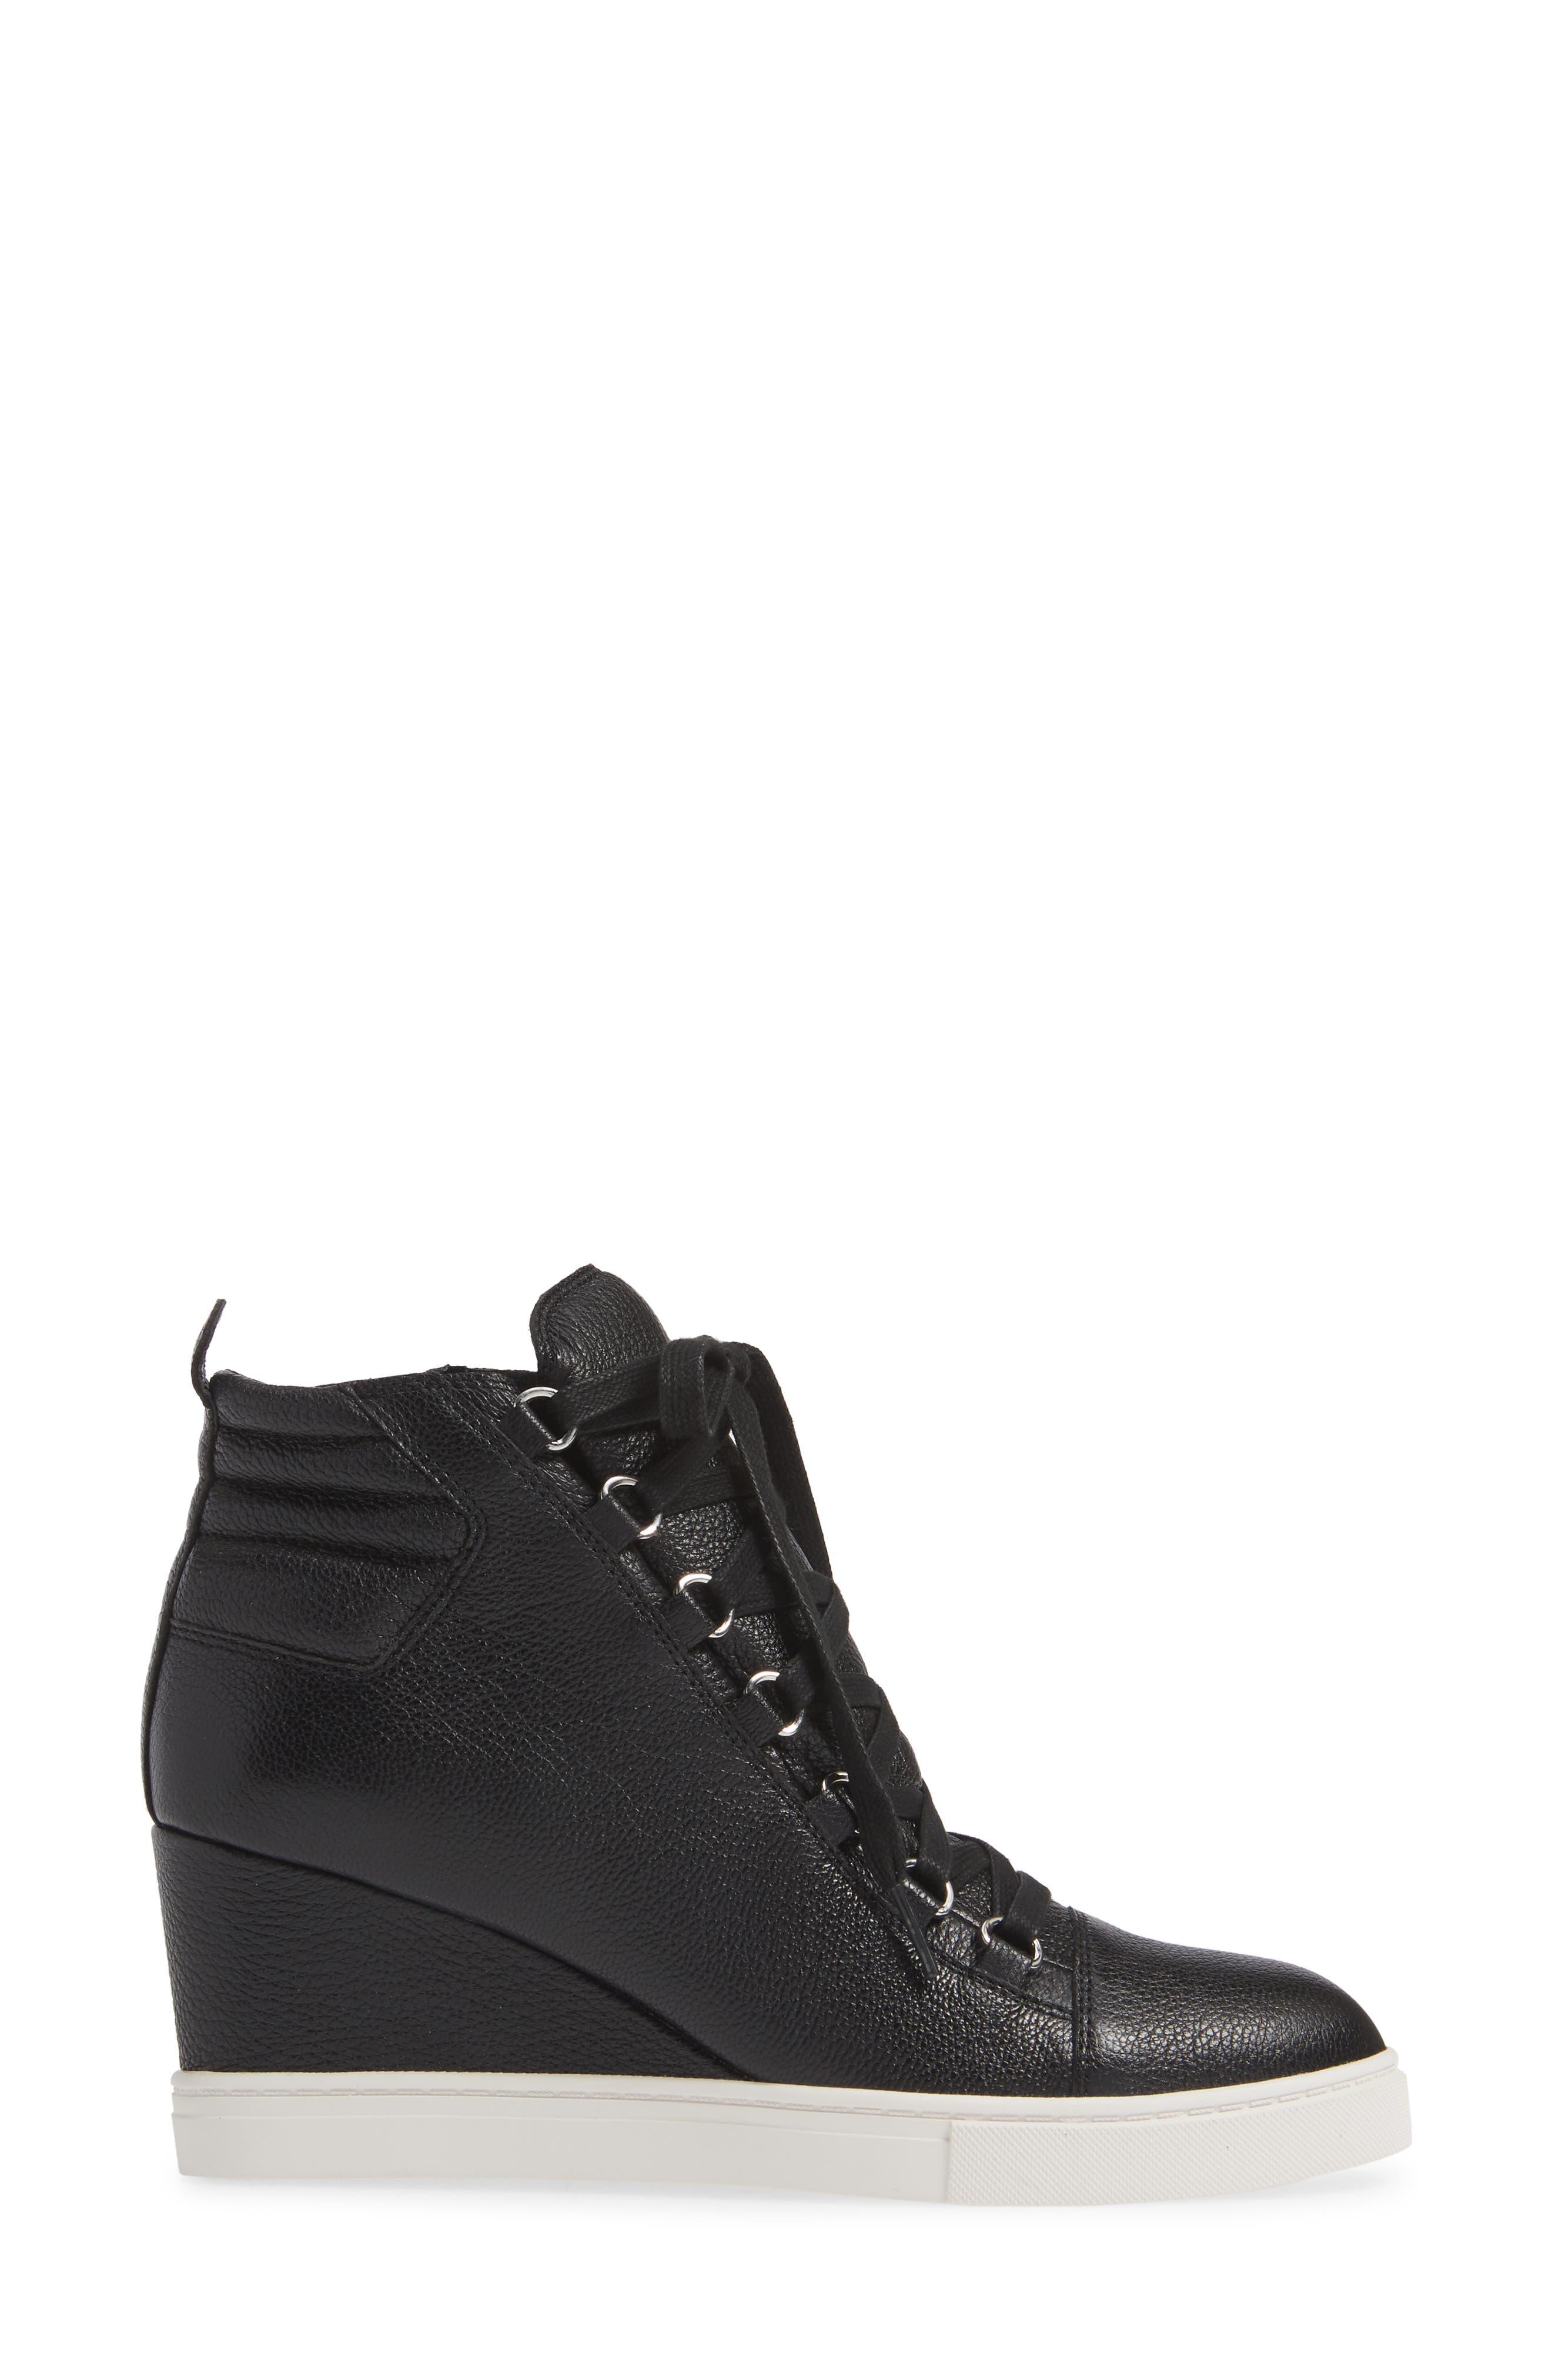 LINEA PAOLO, Fenton Wedge Sneaker, Alternate thumbnail 3, color, BLACK TUMBLED LEATHER